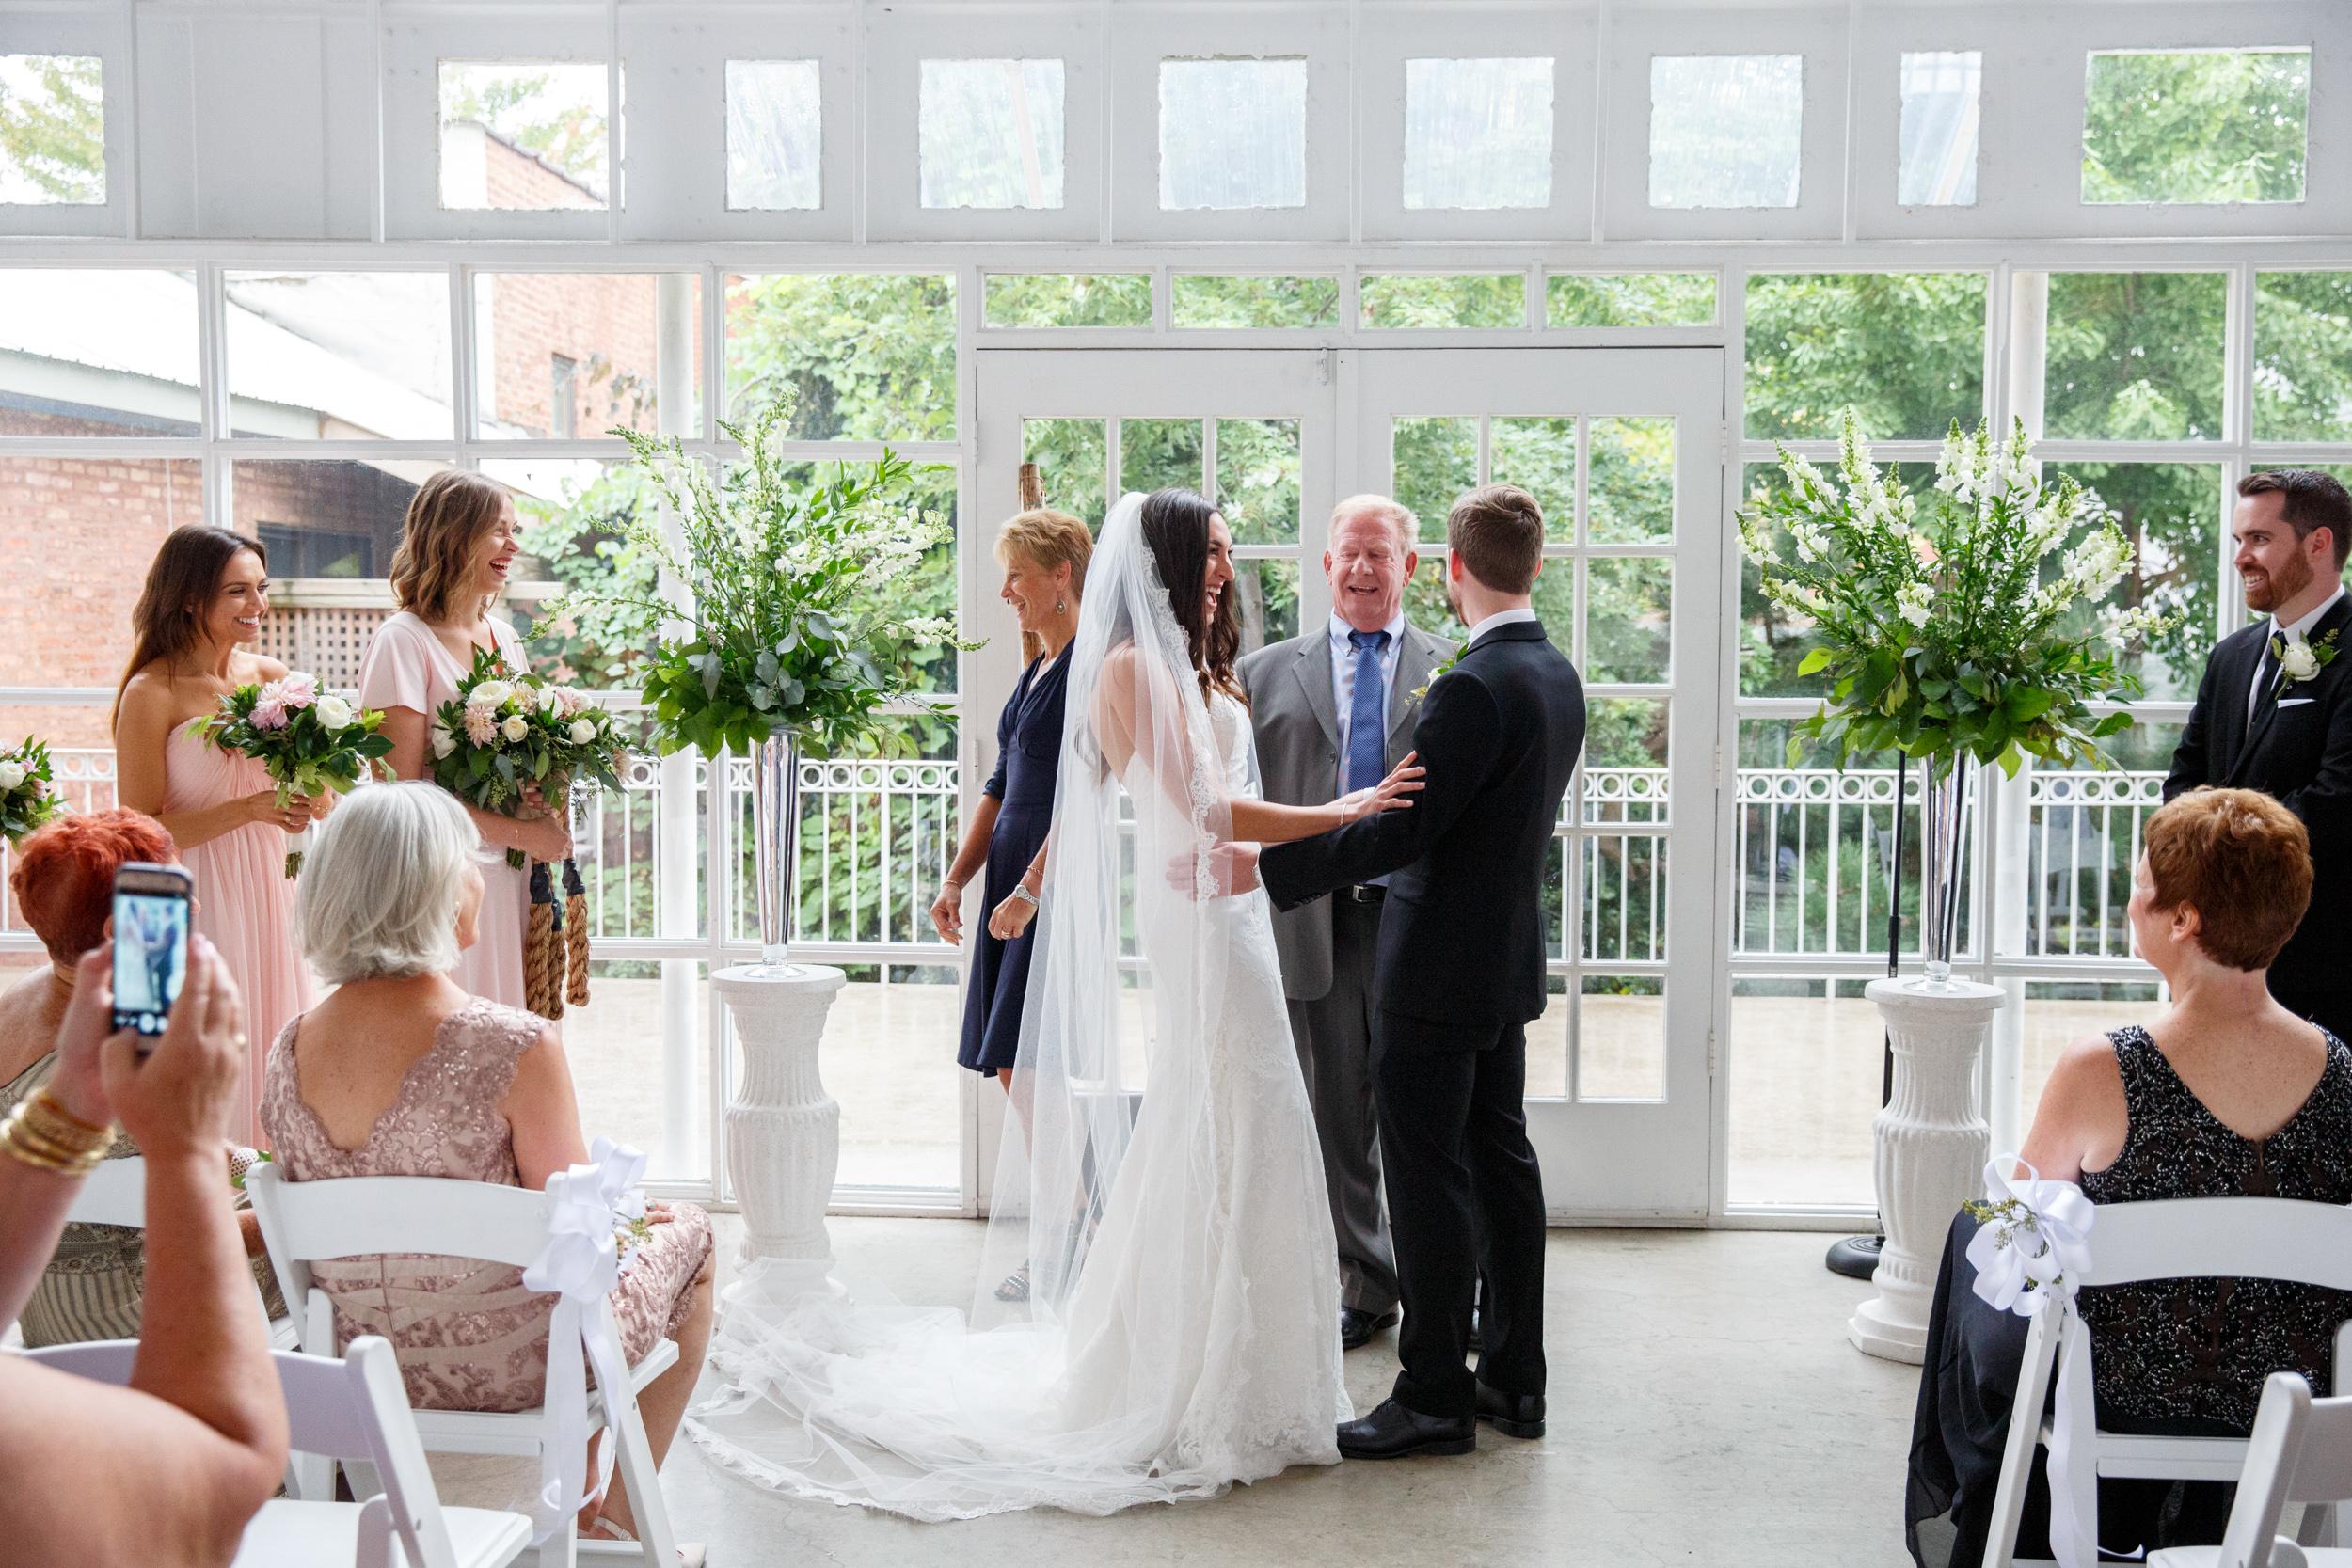 9-09-2016 Flora & Colin wedding photography by Brian Milo-155.jpg